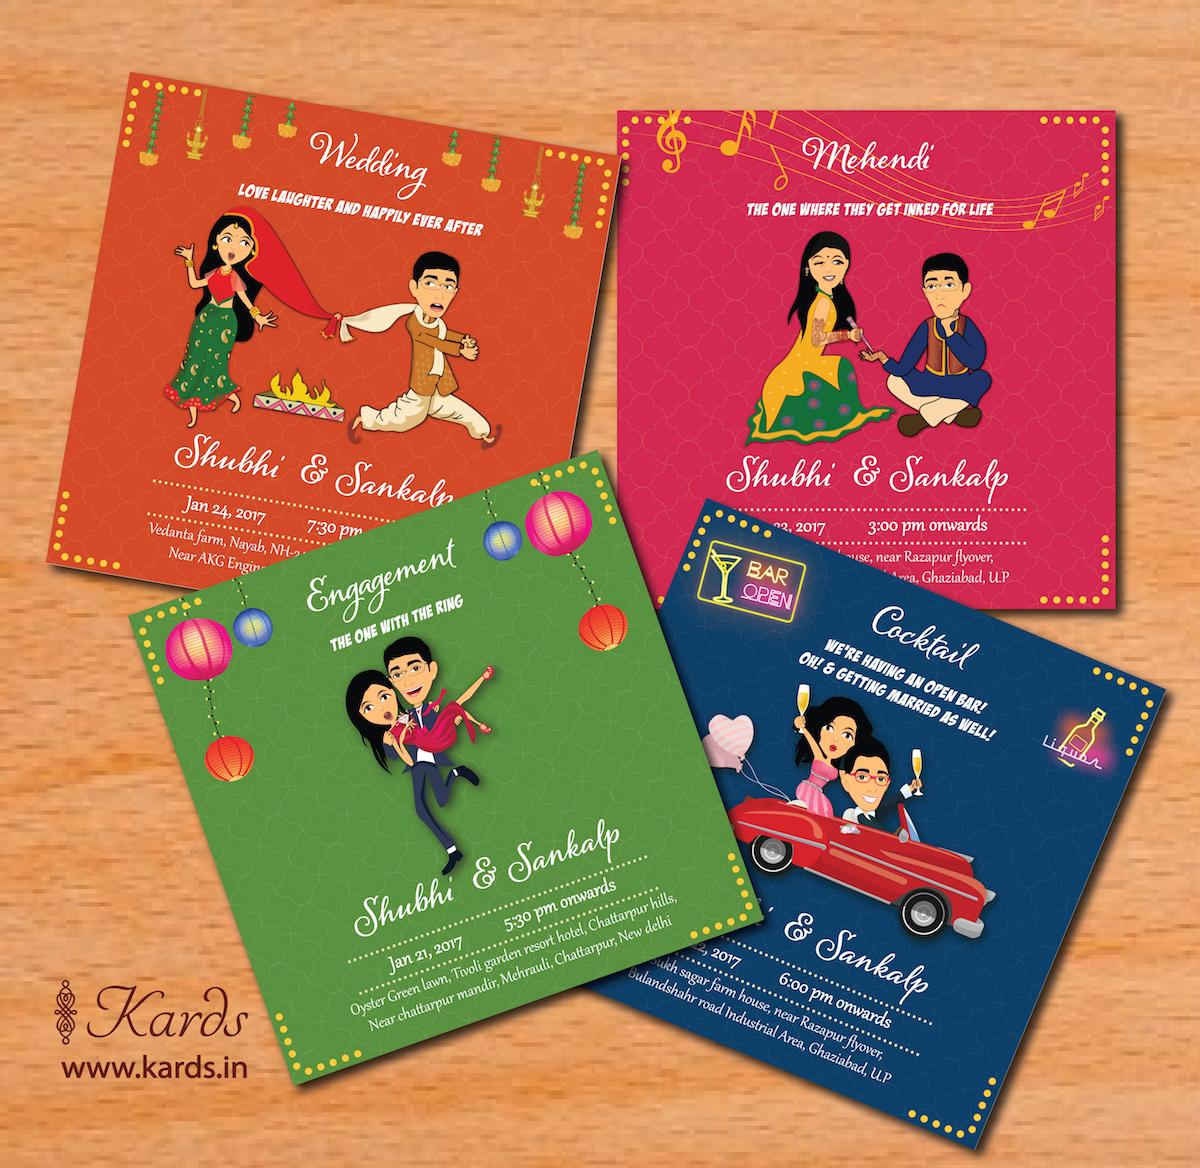 Pinterest Bhavi91 Indianweddingcards Cartoon Wedding Invitations Funny Wedding Invitations Creative Wedding Invitations